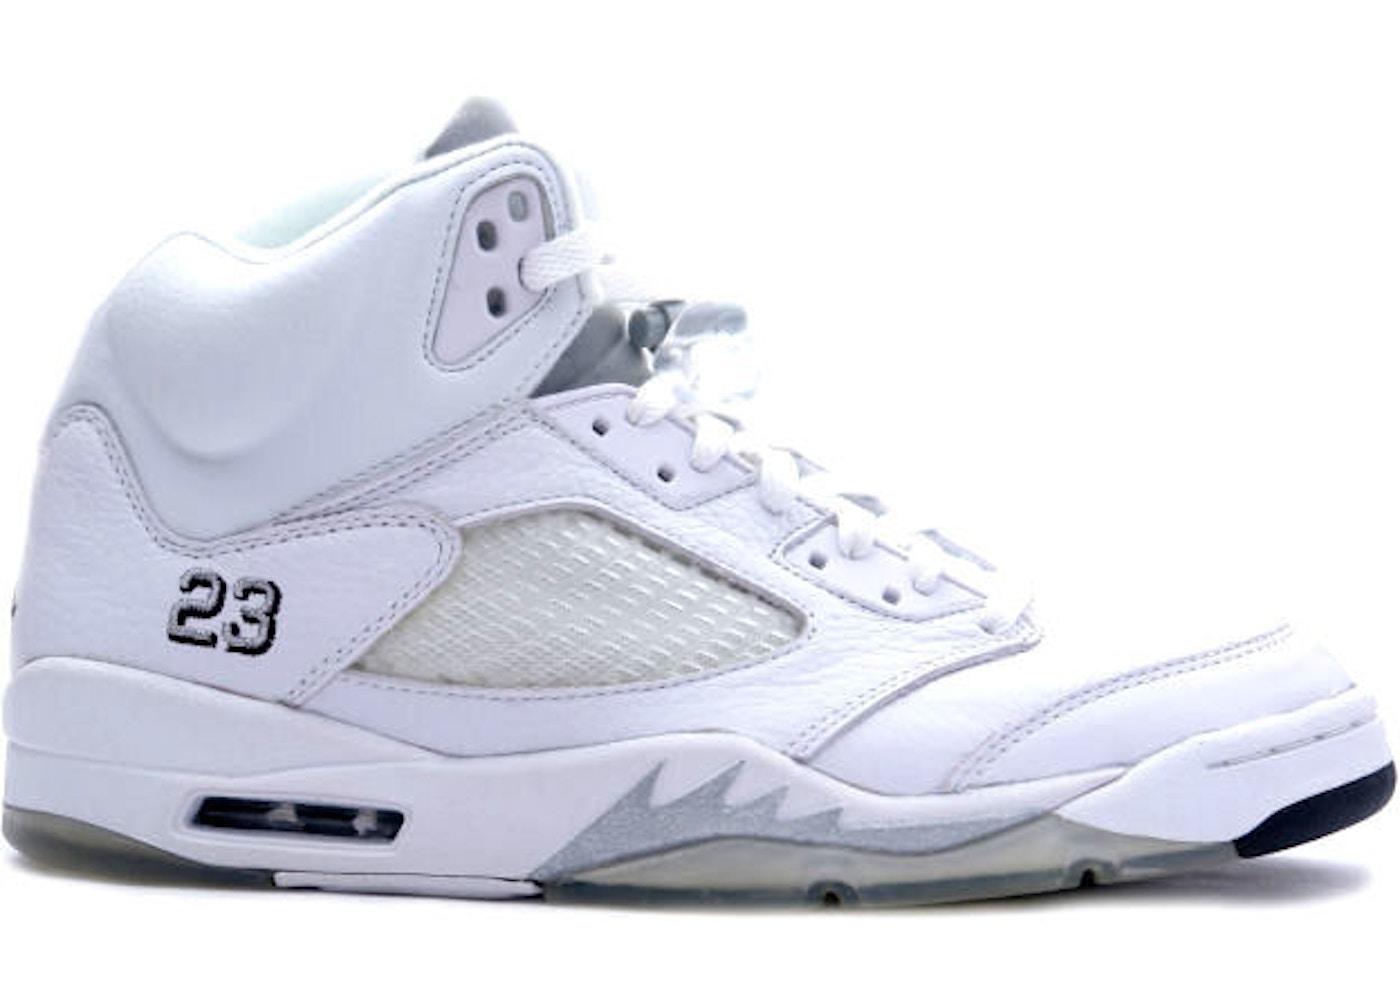 half off 1bf7c cf669 Jordan 5 Retro Metallic White (2000)